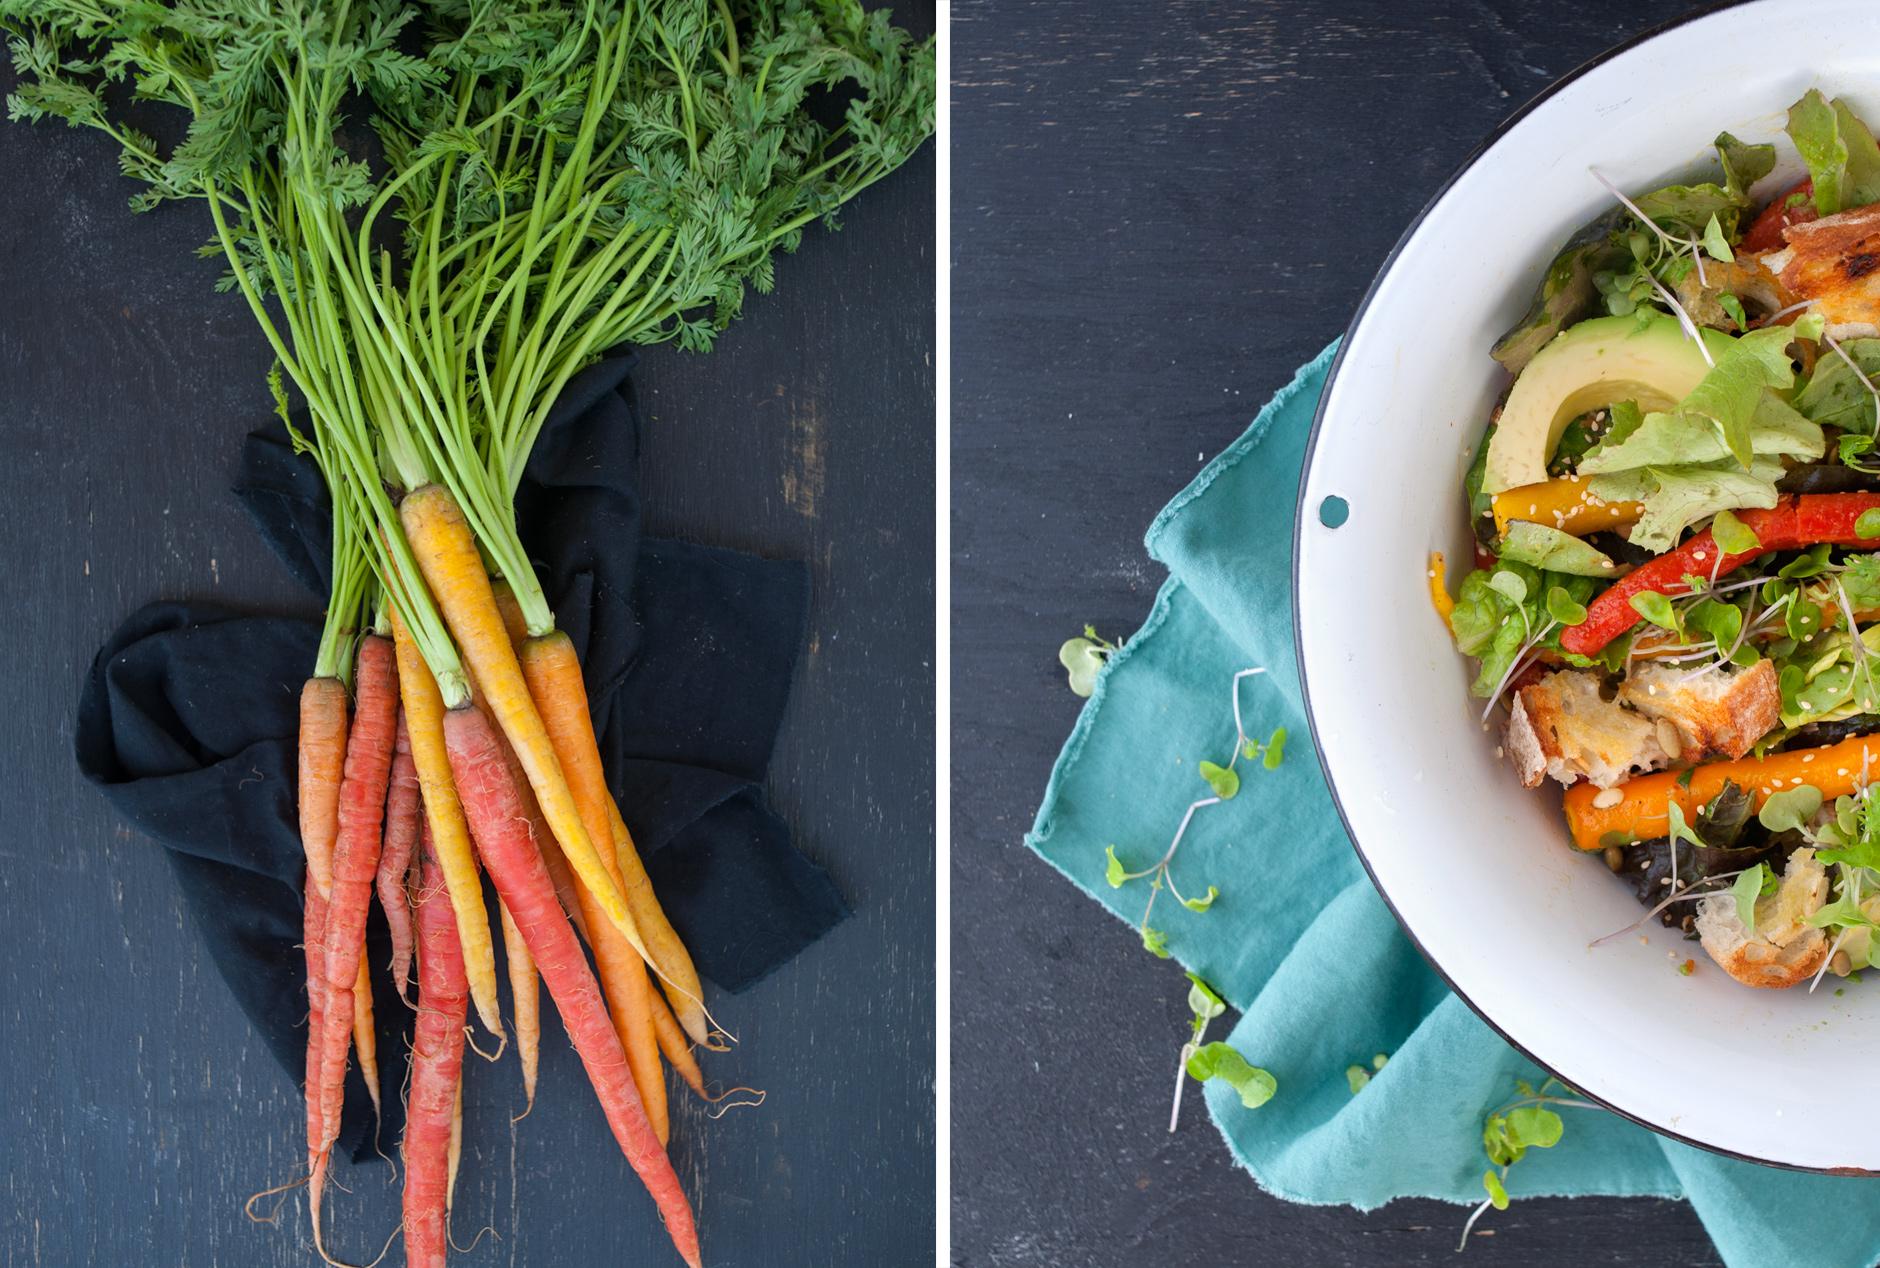 CarrotSalad_food_photography_3.jpg